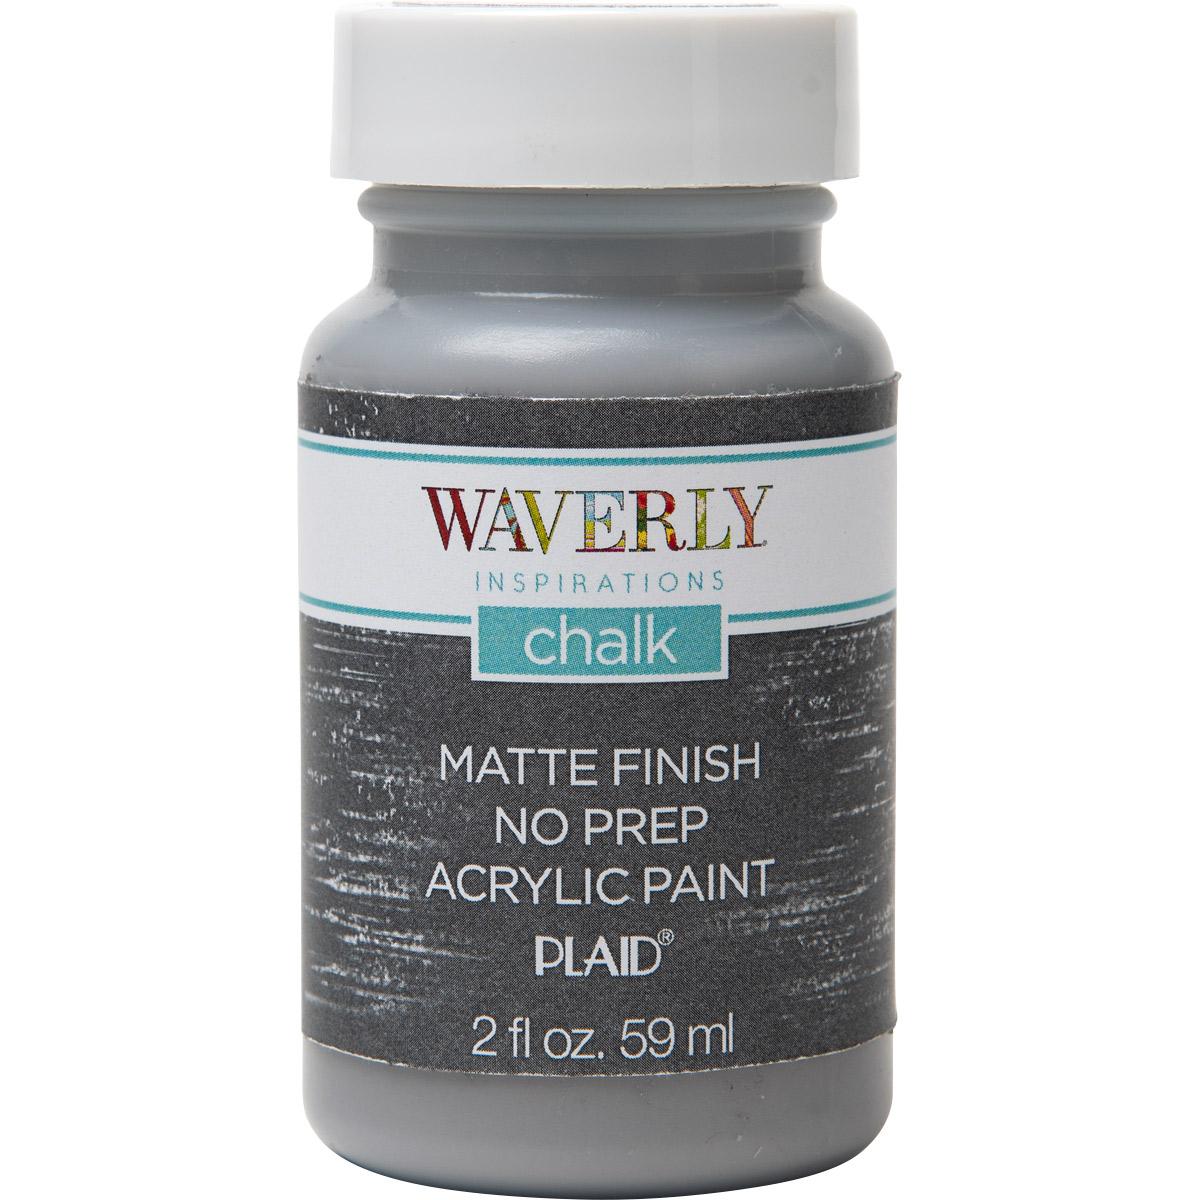 Waverly ® Inspirations Chalk Finish Acrylic Paint - Steel, 2 oz.